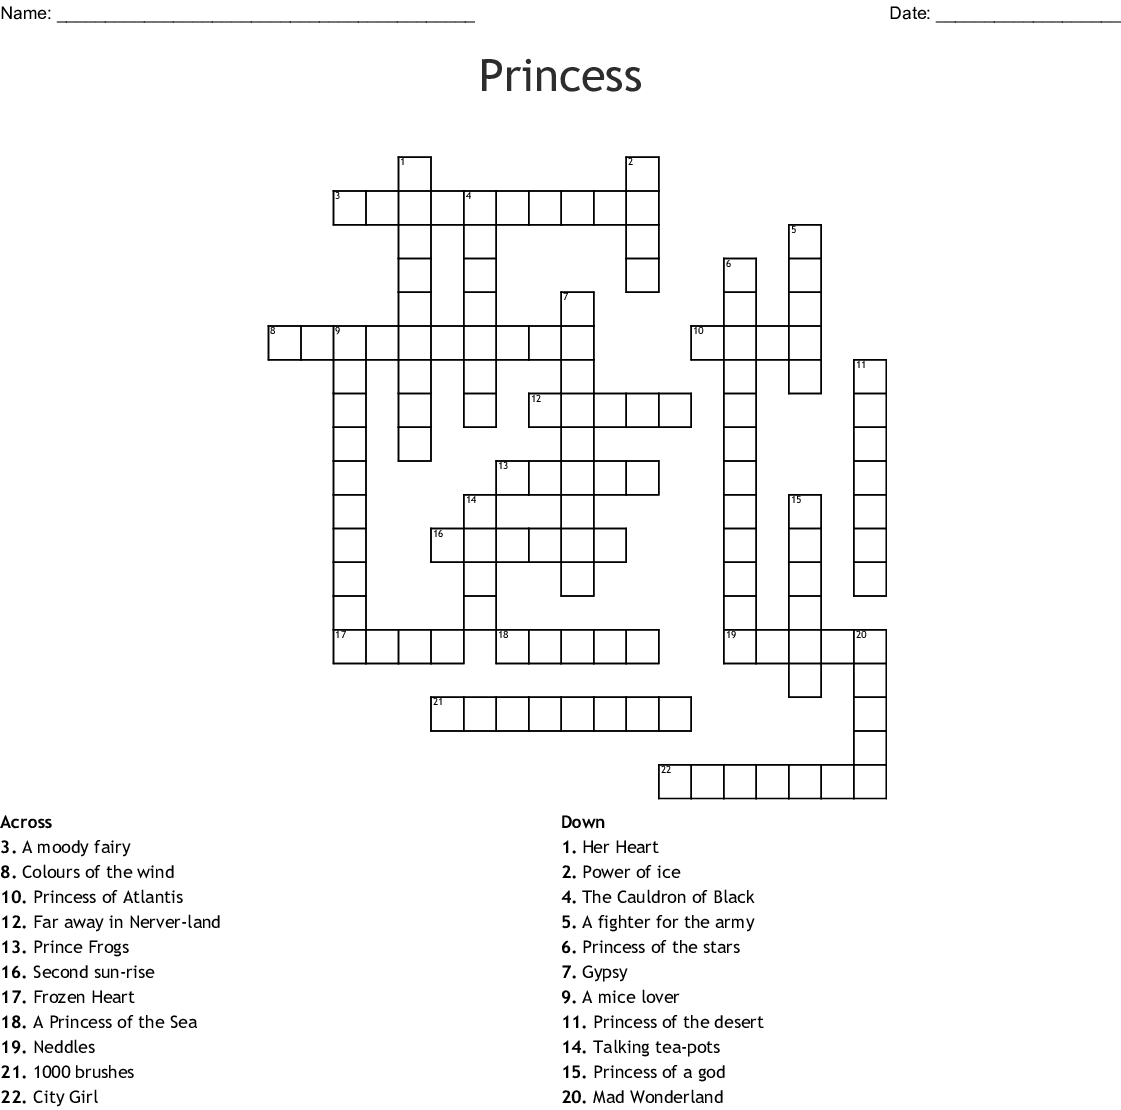 Princess Crossword